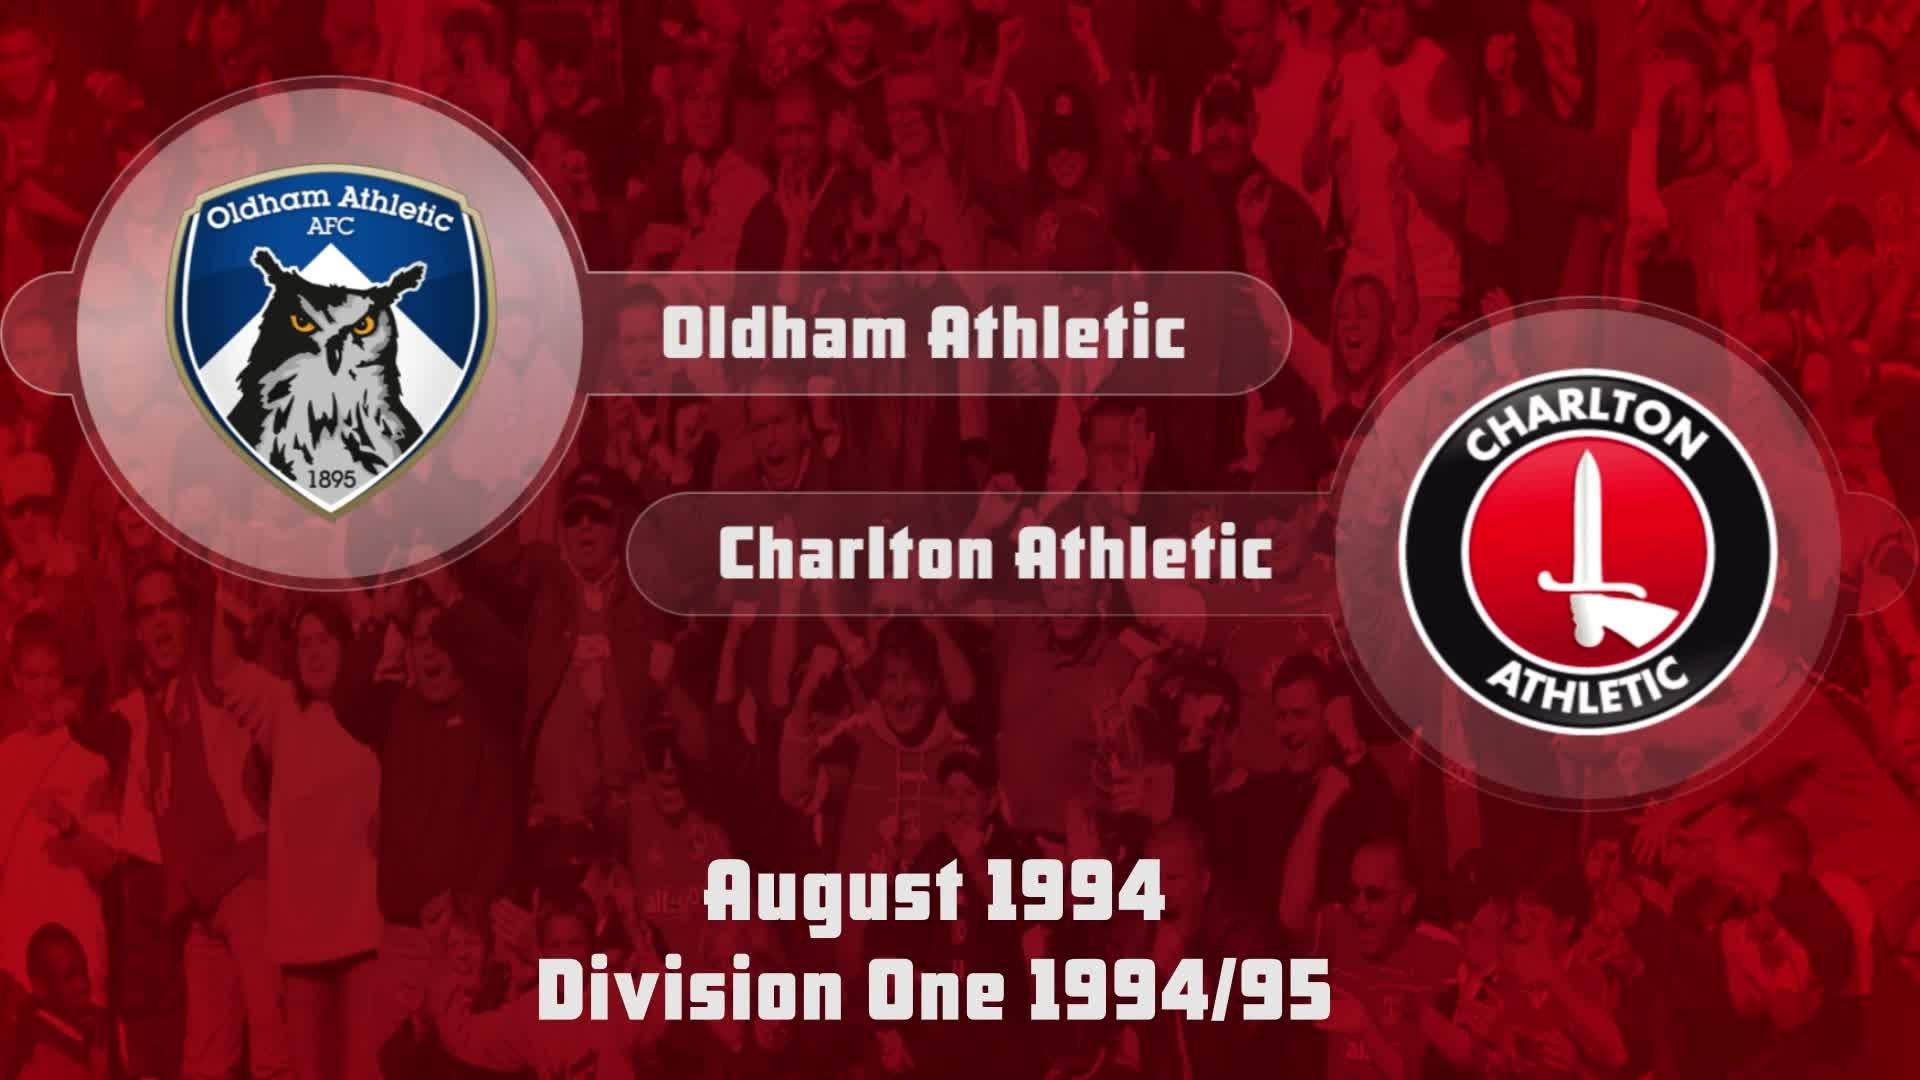 01 HIGHLIGHTS   Oldham 5 Charlton 2 (Aug 1994)